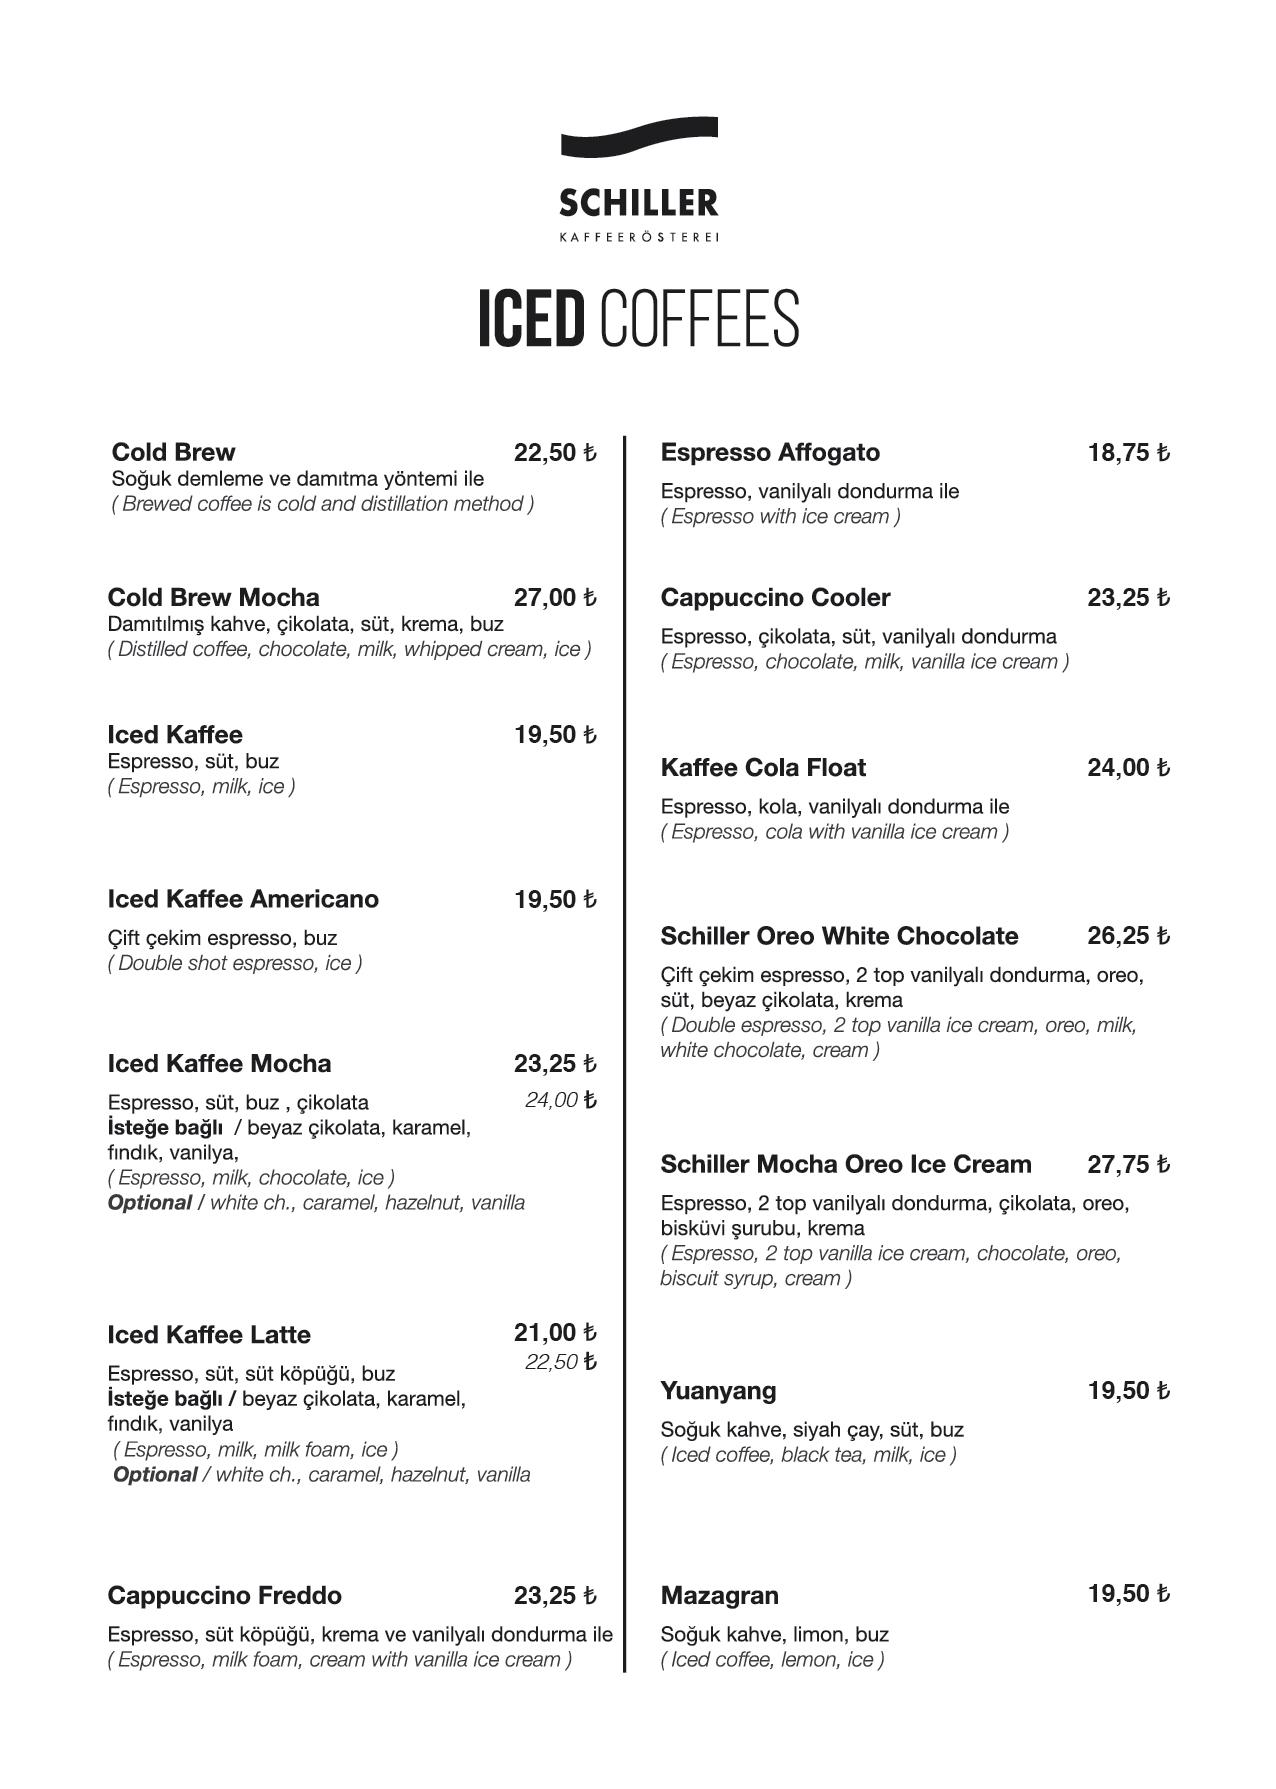 Iced Coffees